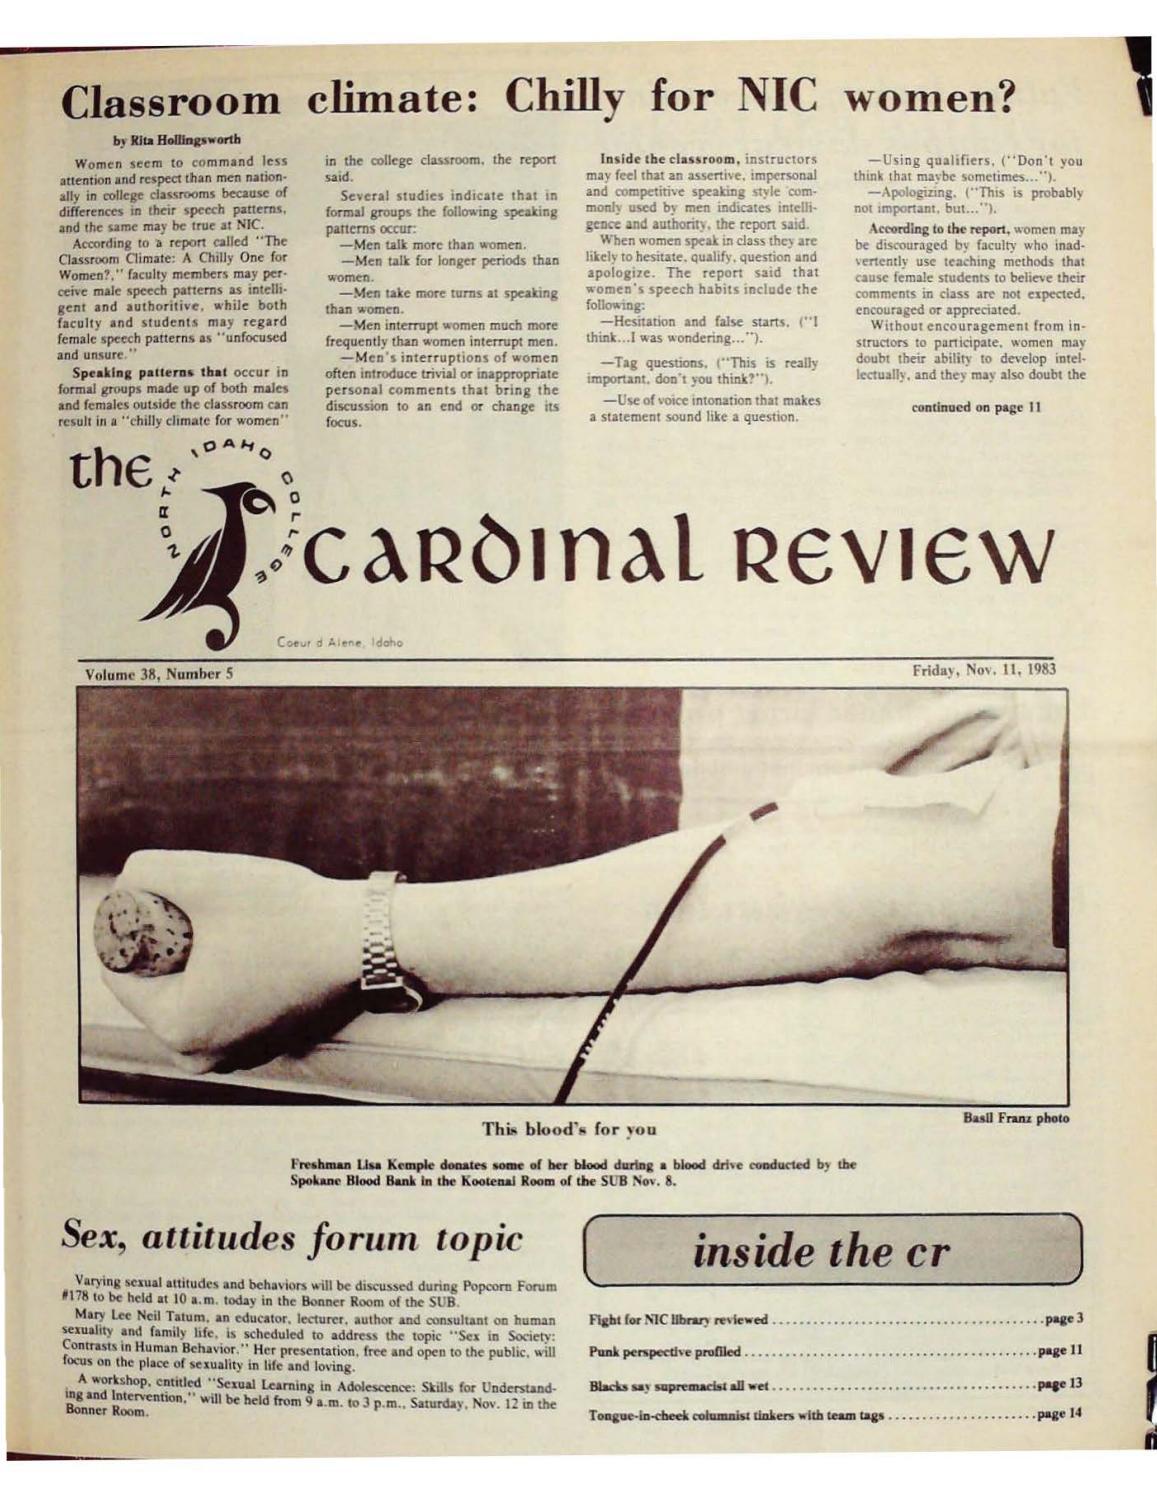 North Idaho College Cardinal Review Vol 38 No 5, Nov 11